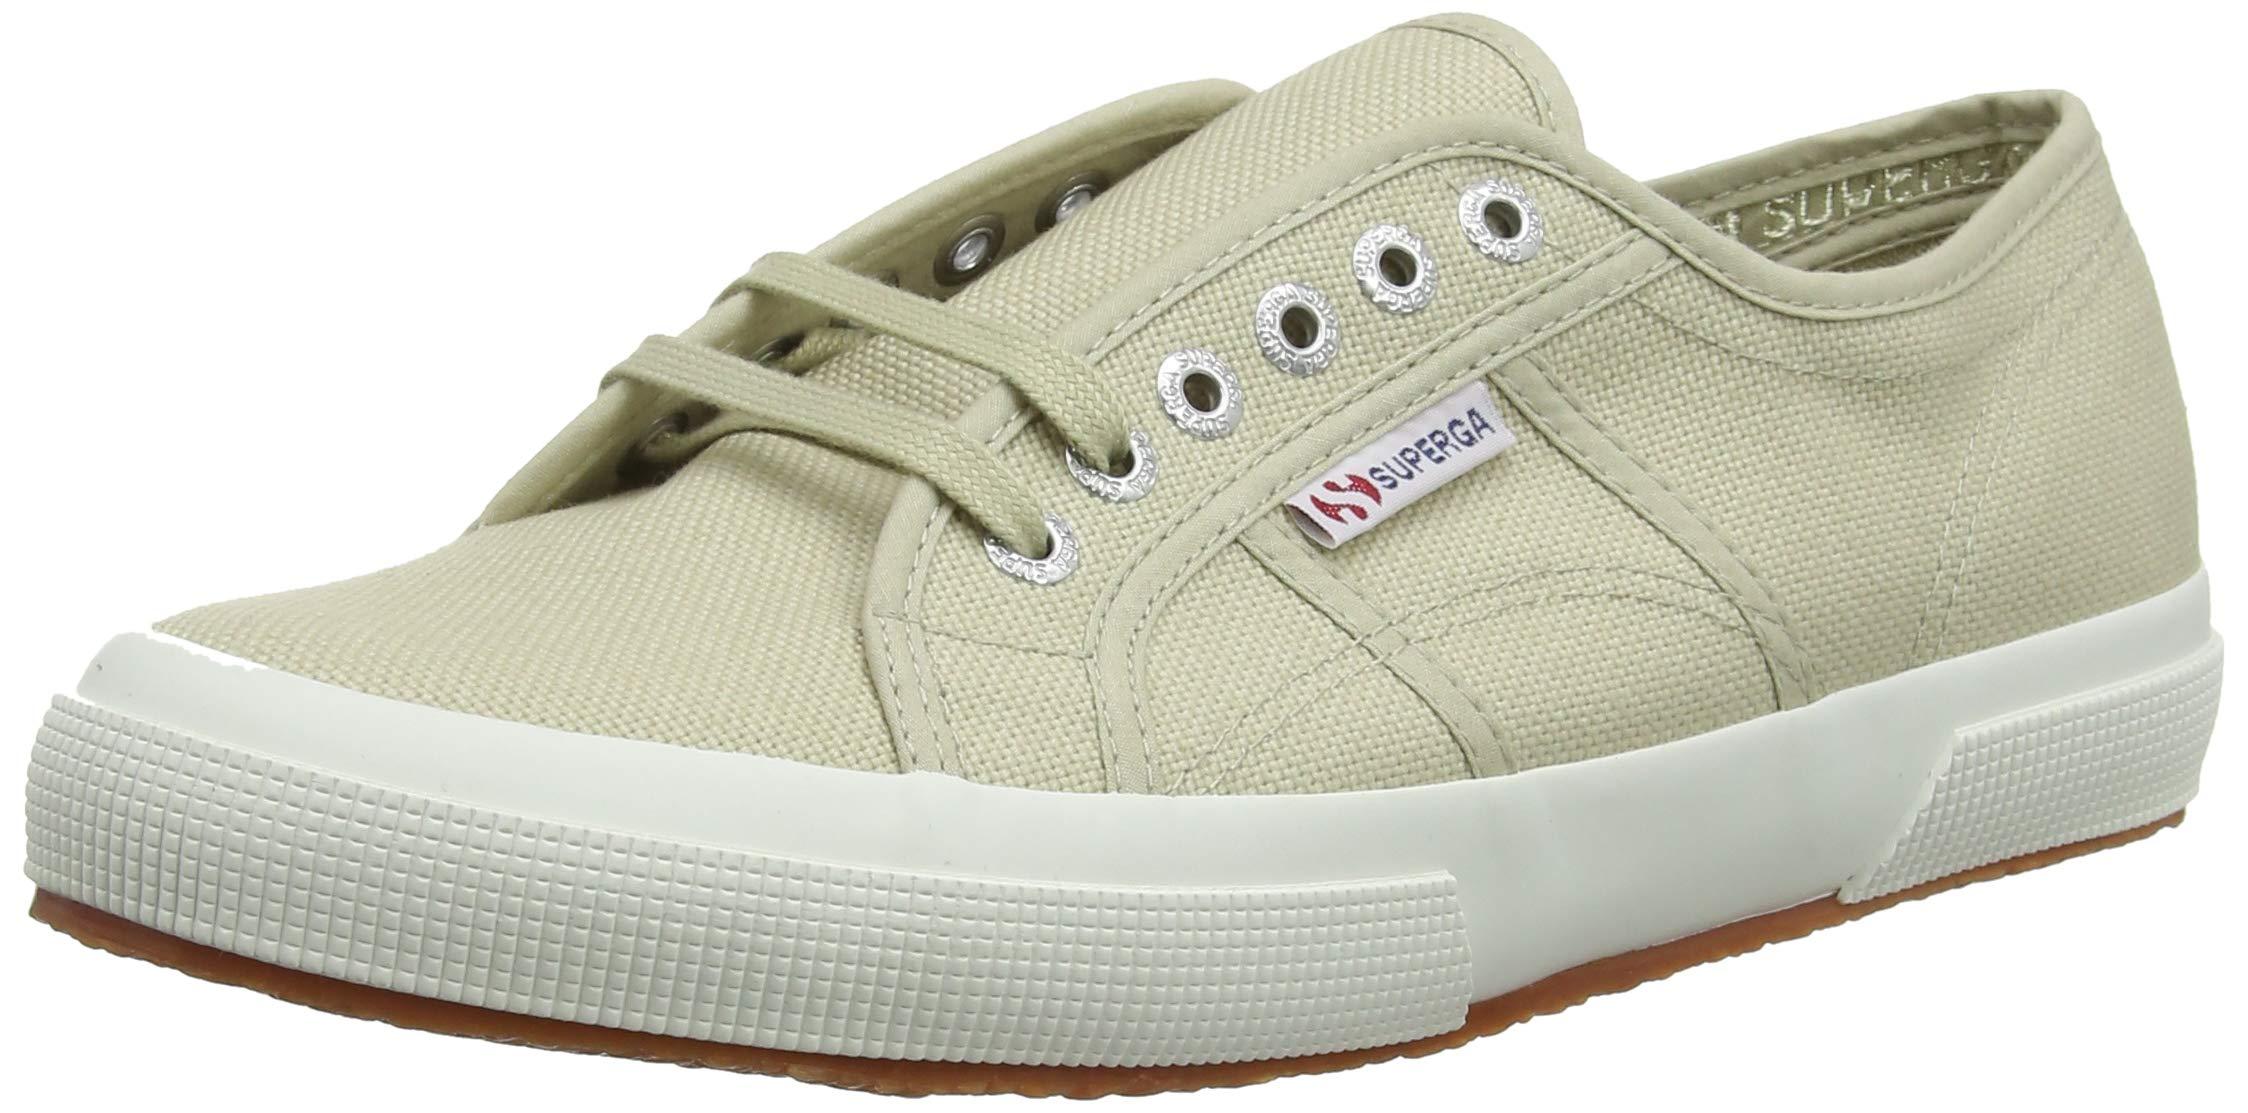 Superga Basses Cotu Eu 2750 Browntaupe47 ClassicSneakers HommeMarron K3lFcT1J